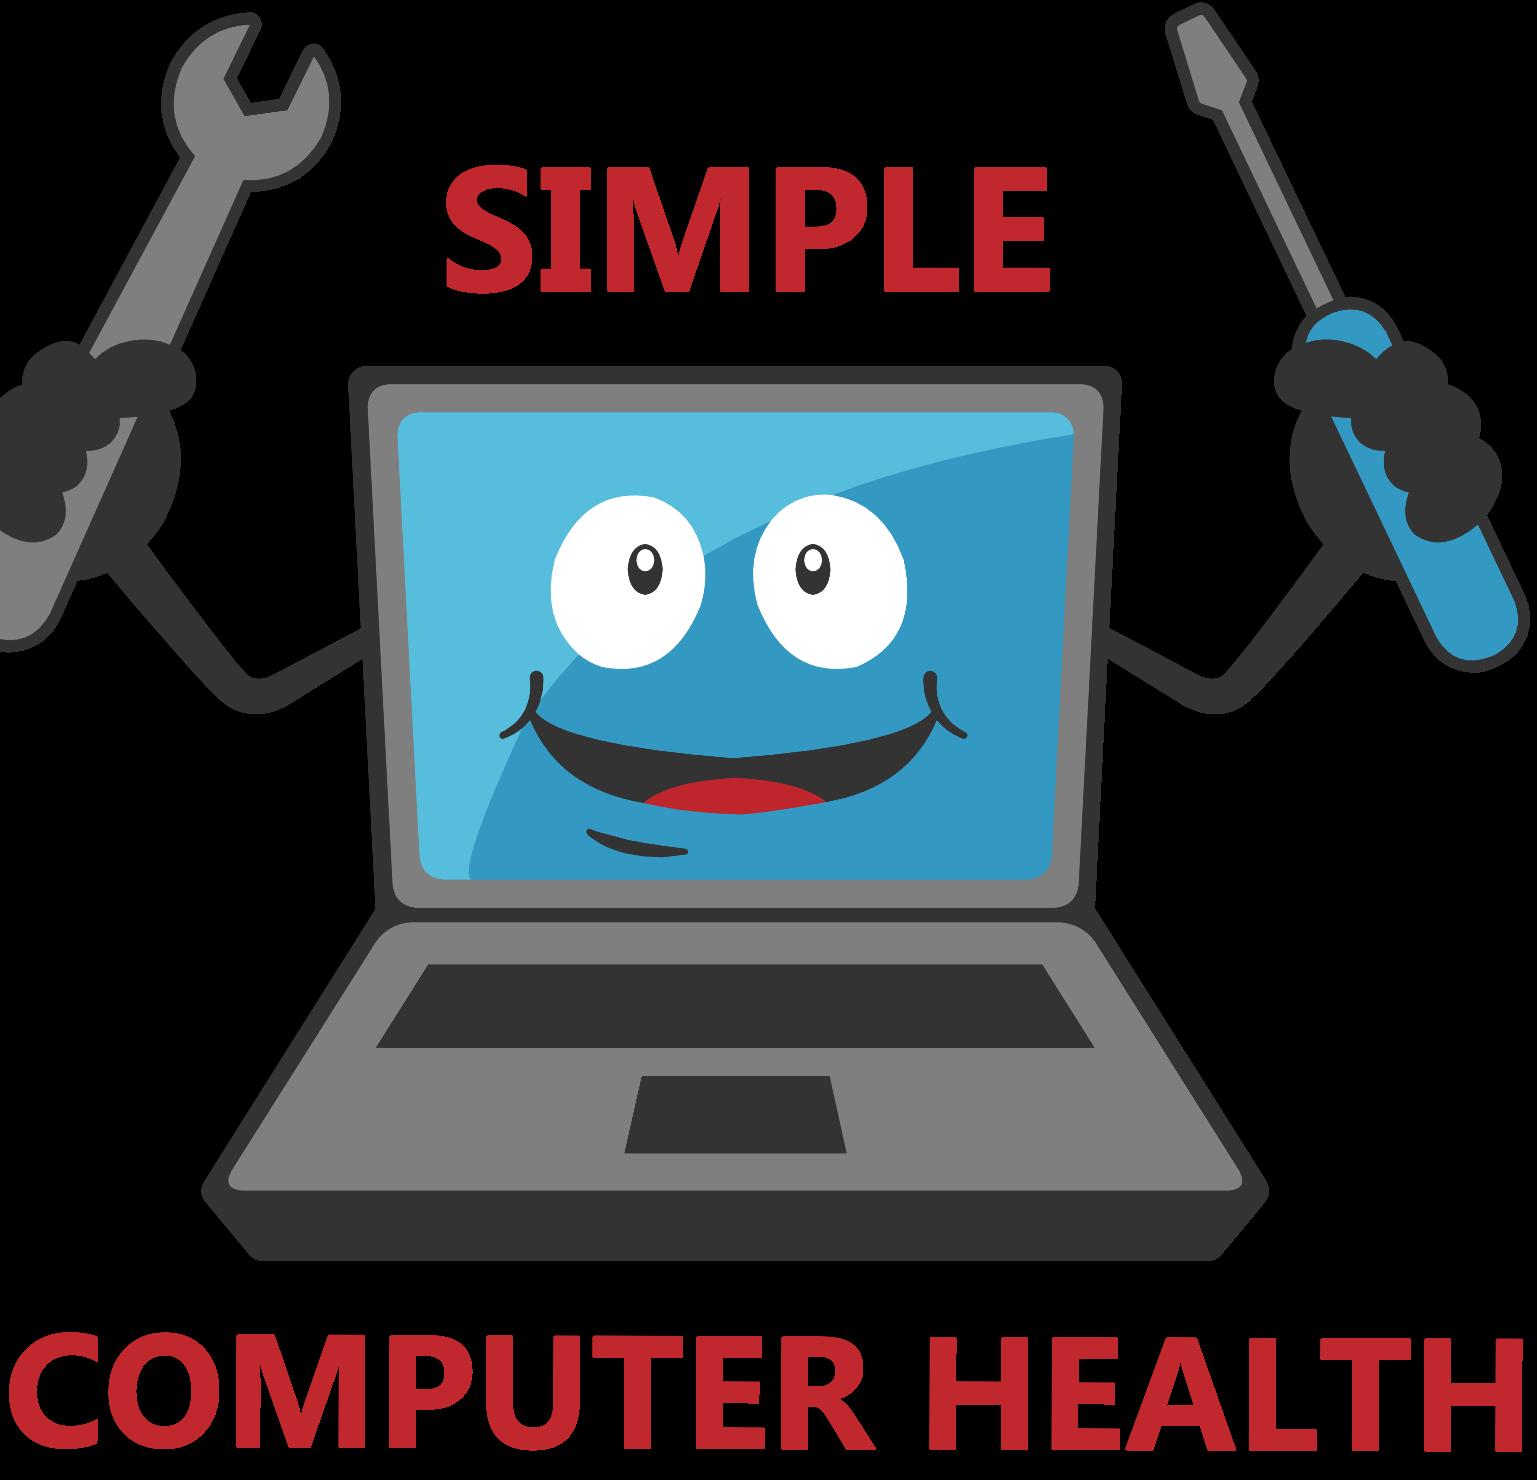 SIMPLE COMPUTER HEALTH